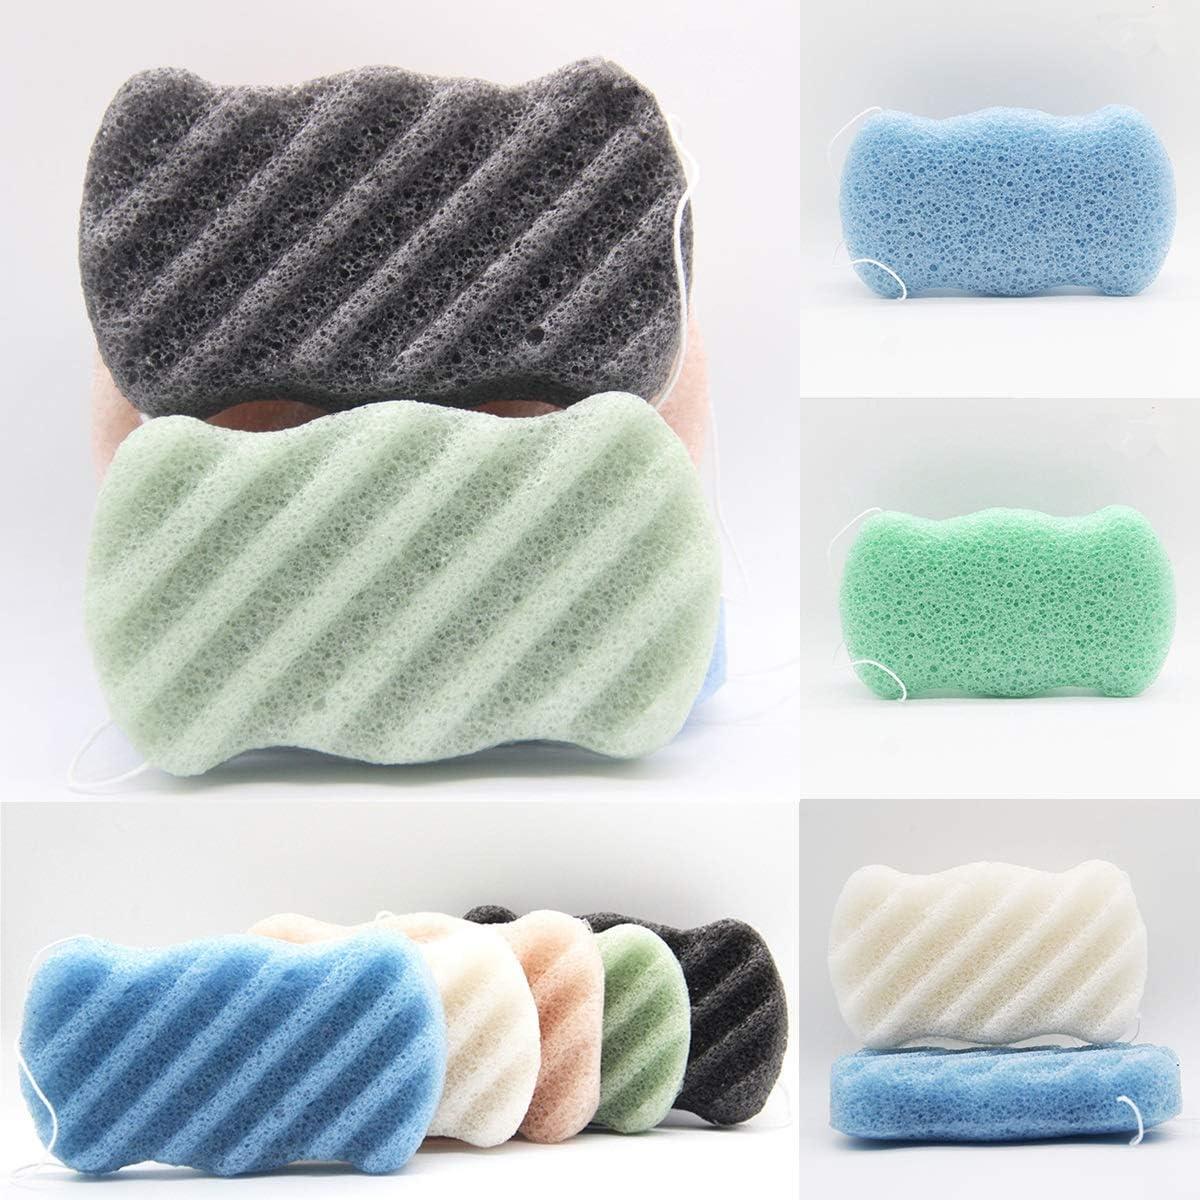 HaiQianXin Natural Konjac Konnyaku Facial Puff Exfoliator Removal Face Cleanse Washing Sponge Color : Green